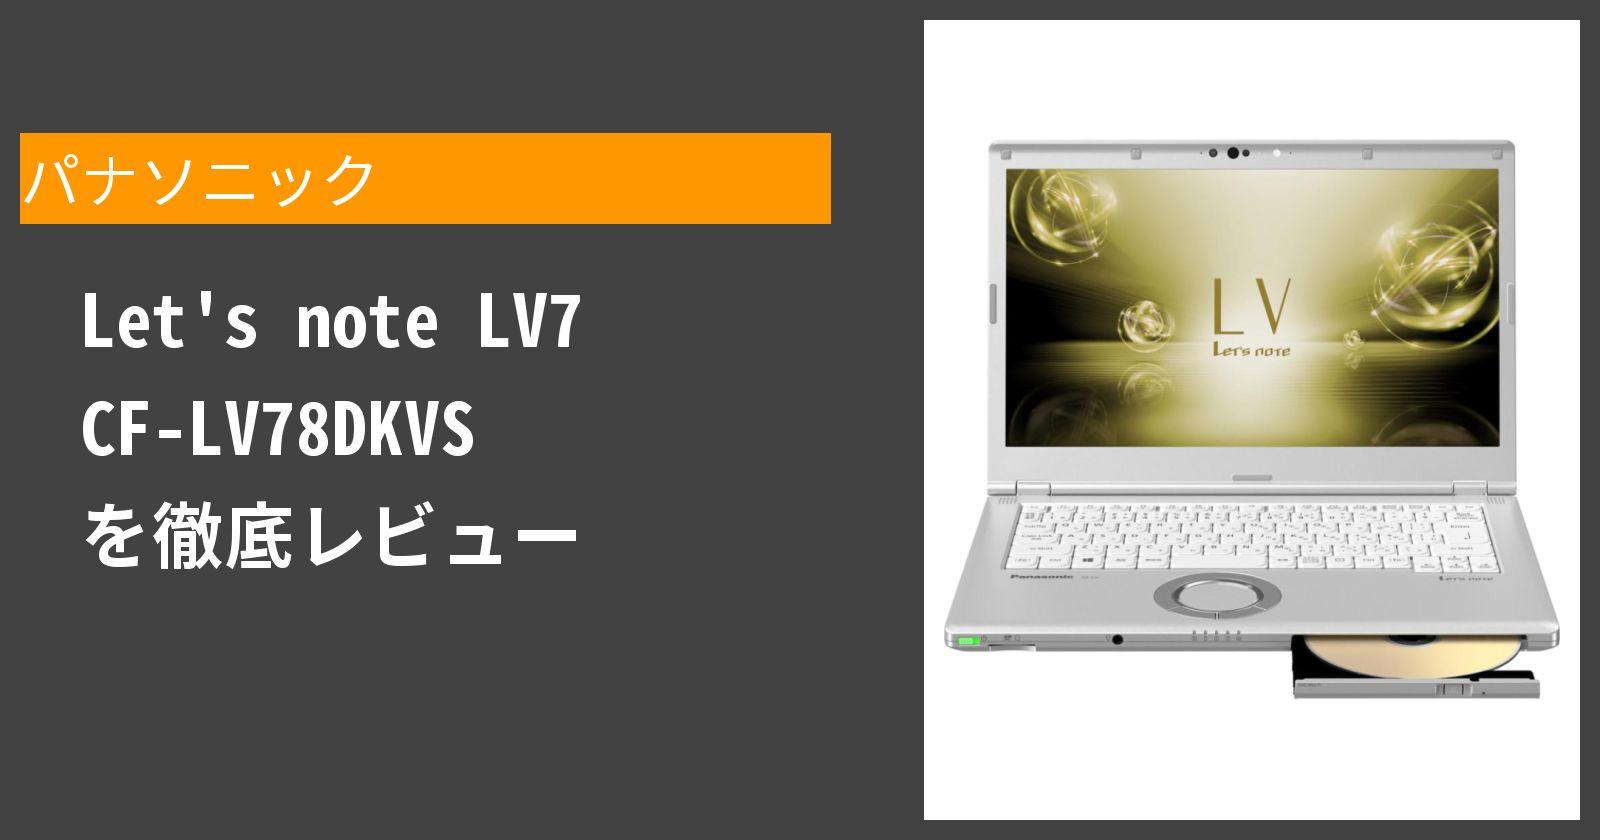 Let's note LV7 CF-LV78DKVSを徹底評価